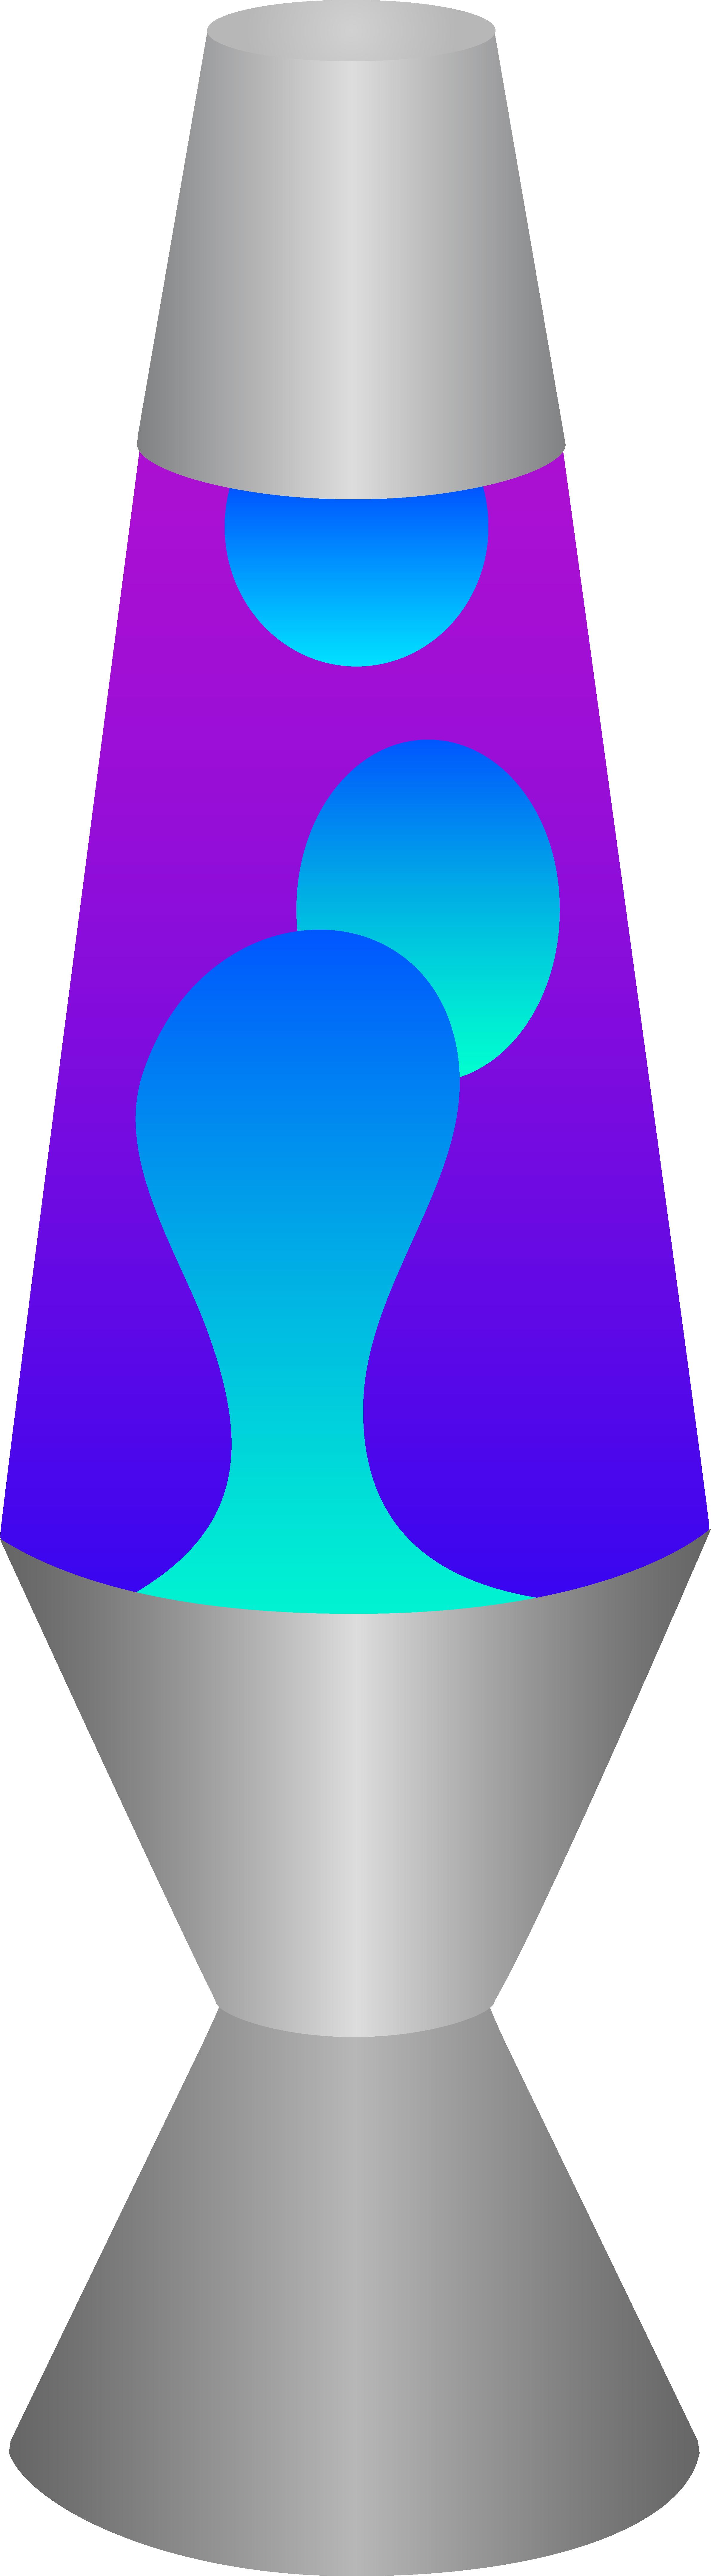 Indian clipart lantern. Liquid panda free images